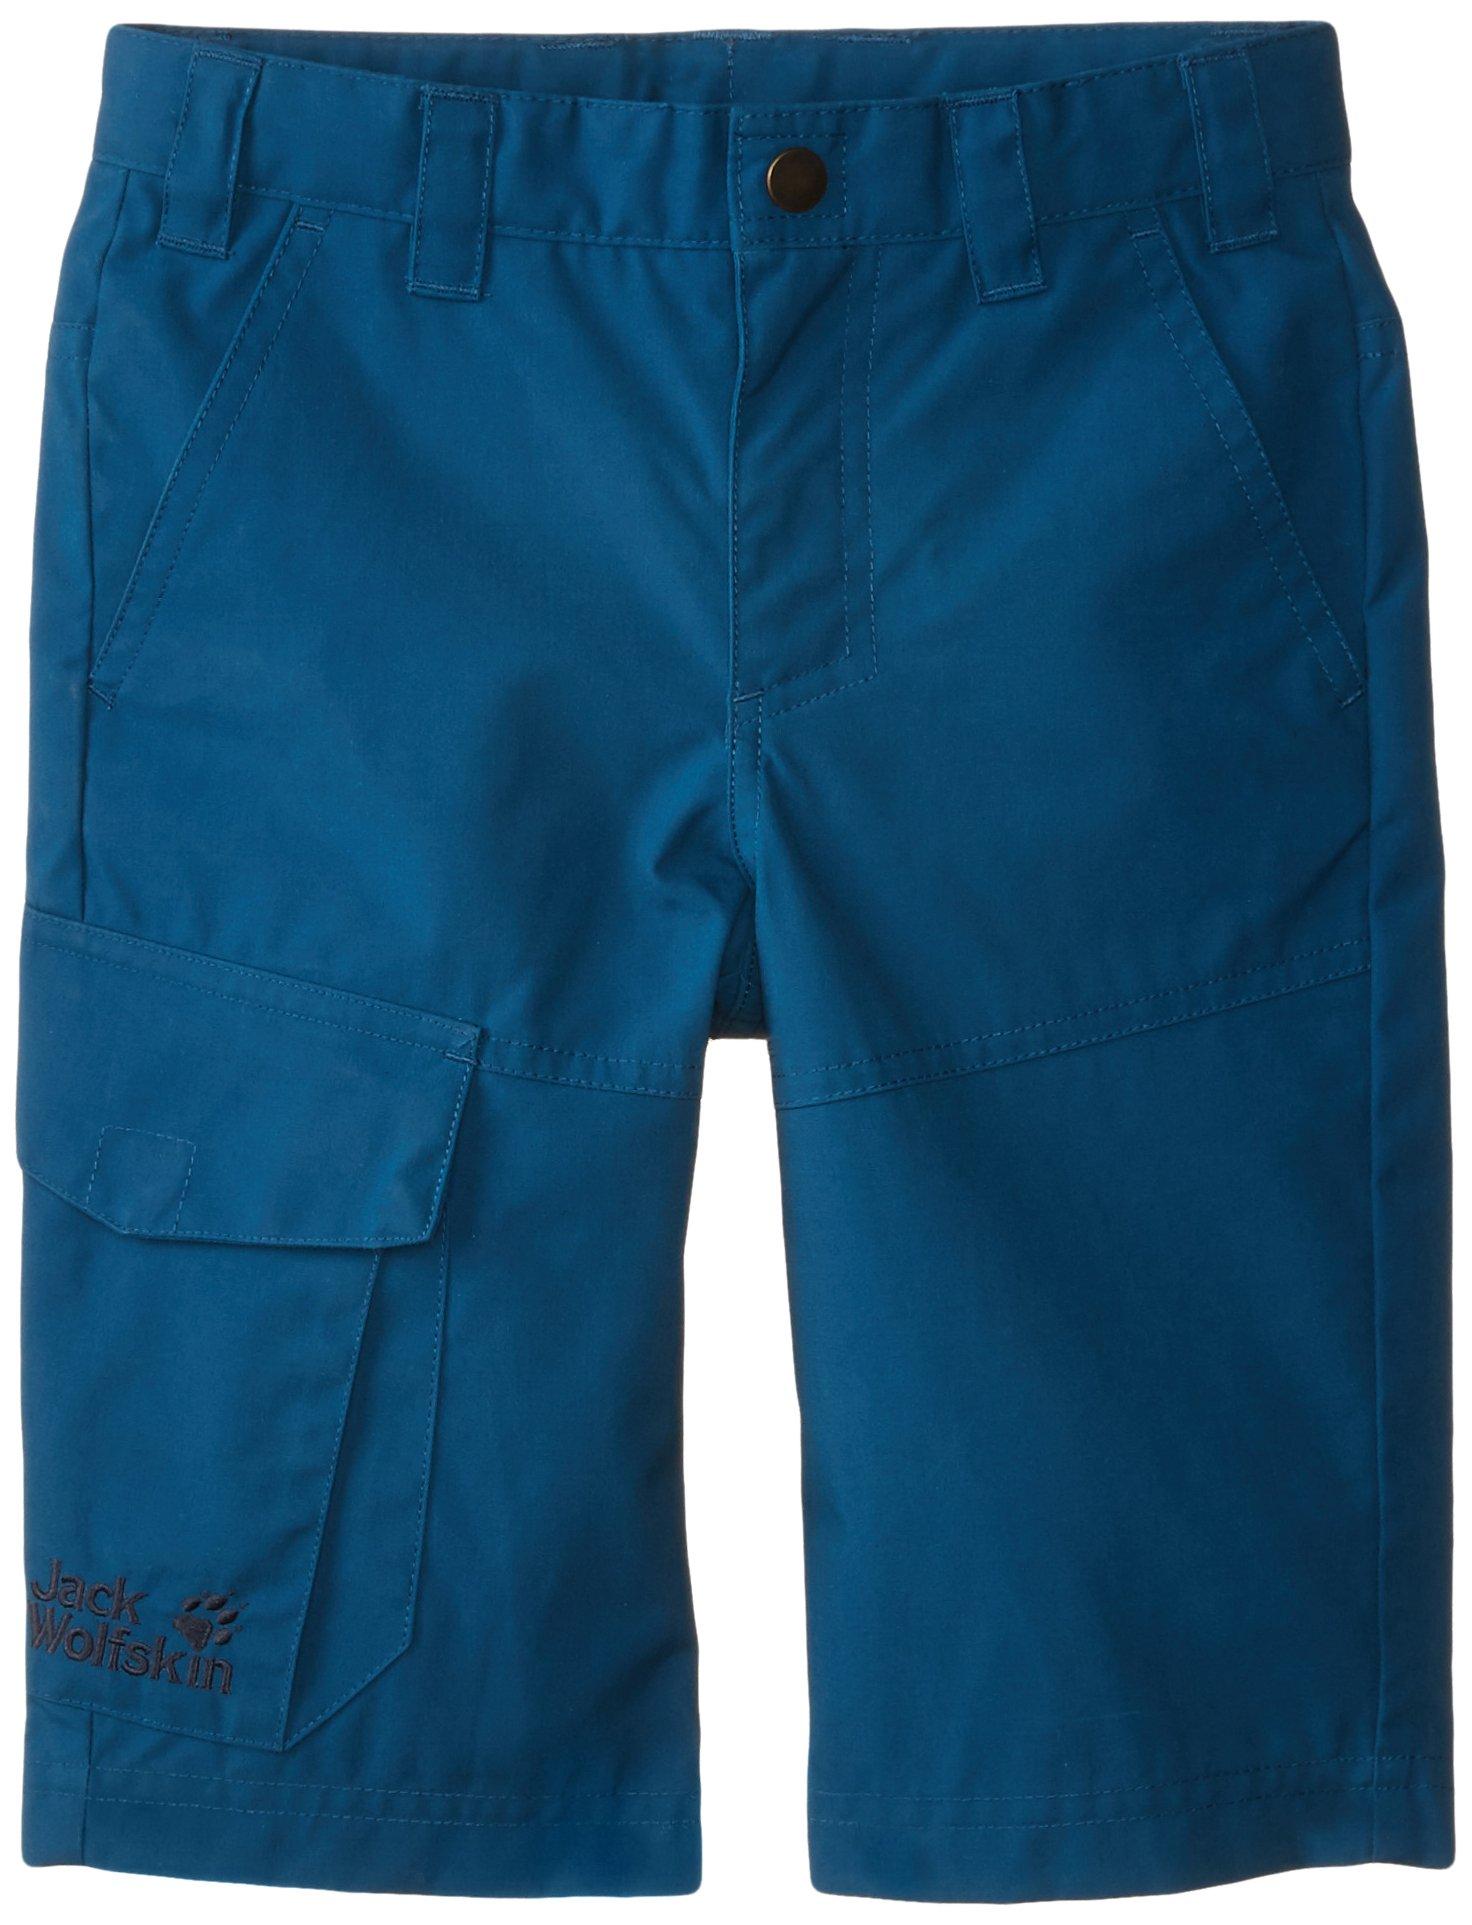 Jack Wolfskin Boy's Amber Road F65 Shorts, Moroccan Blue, 104